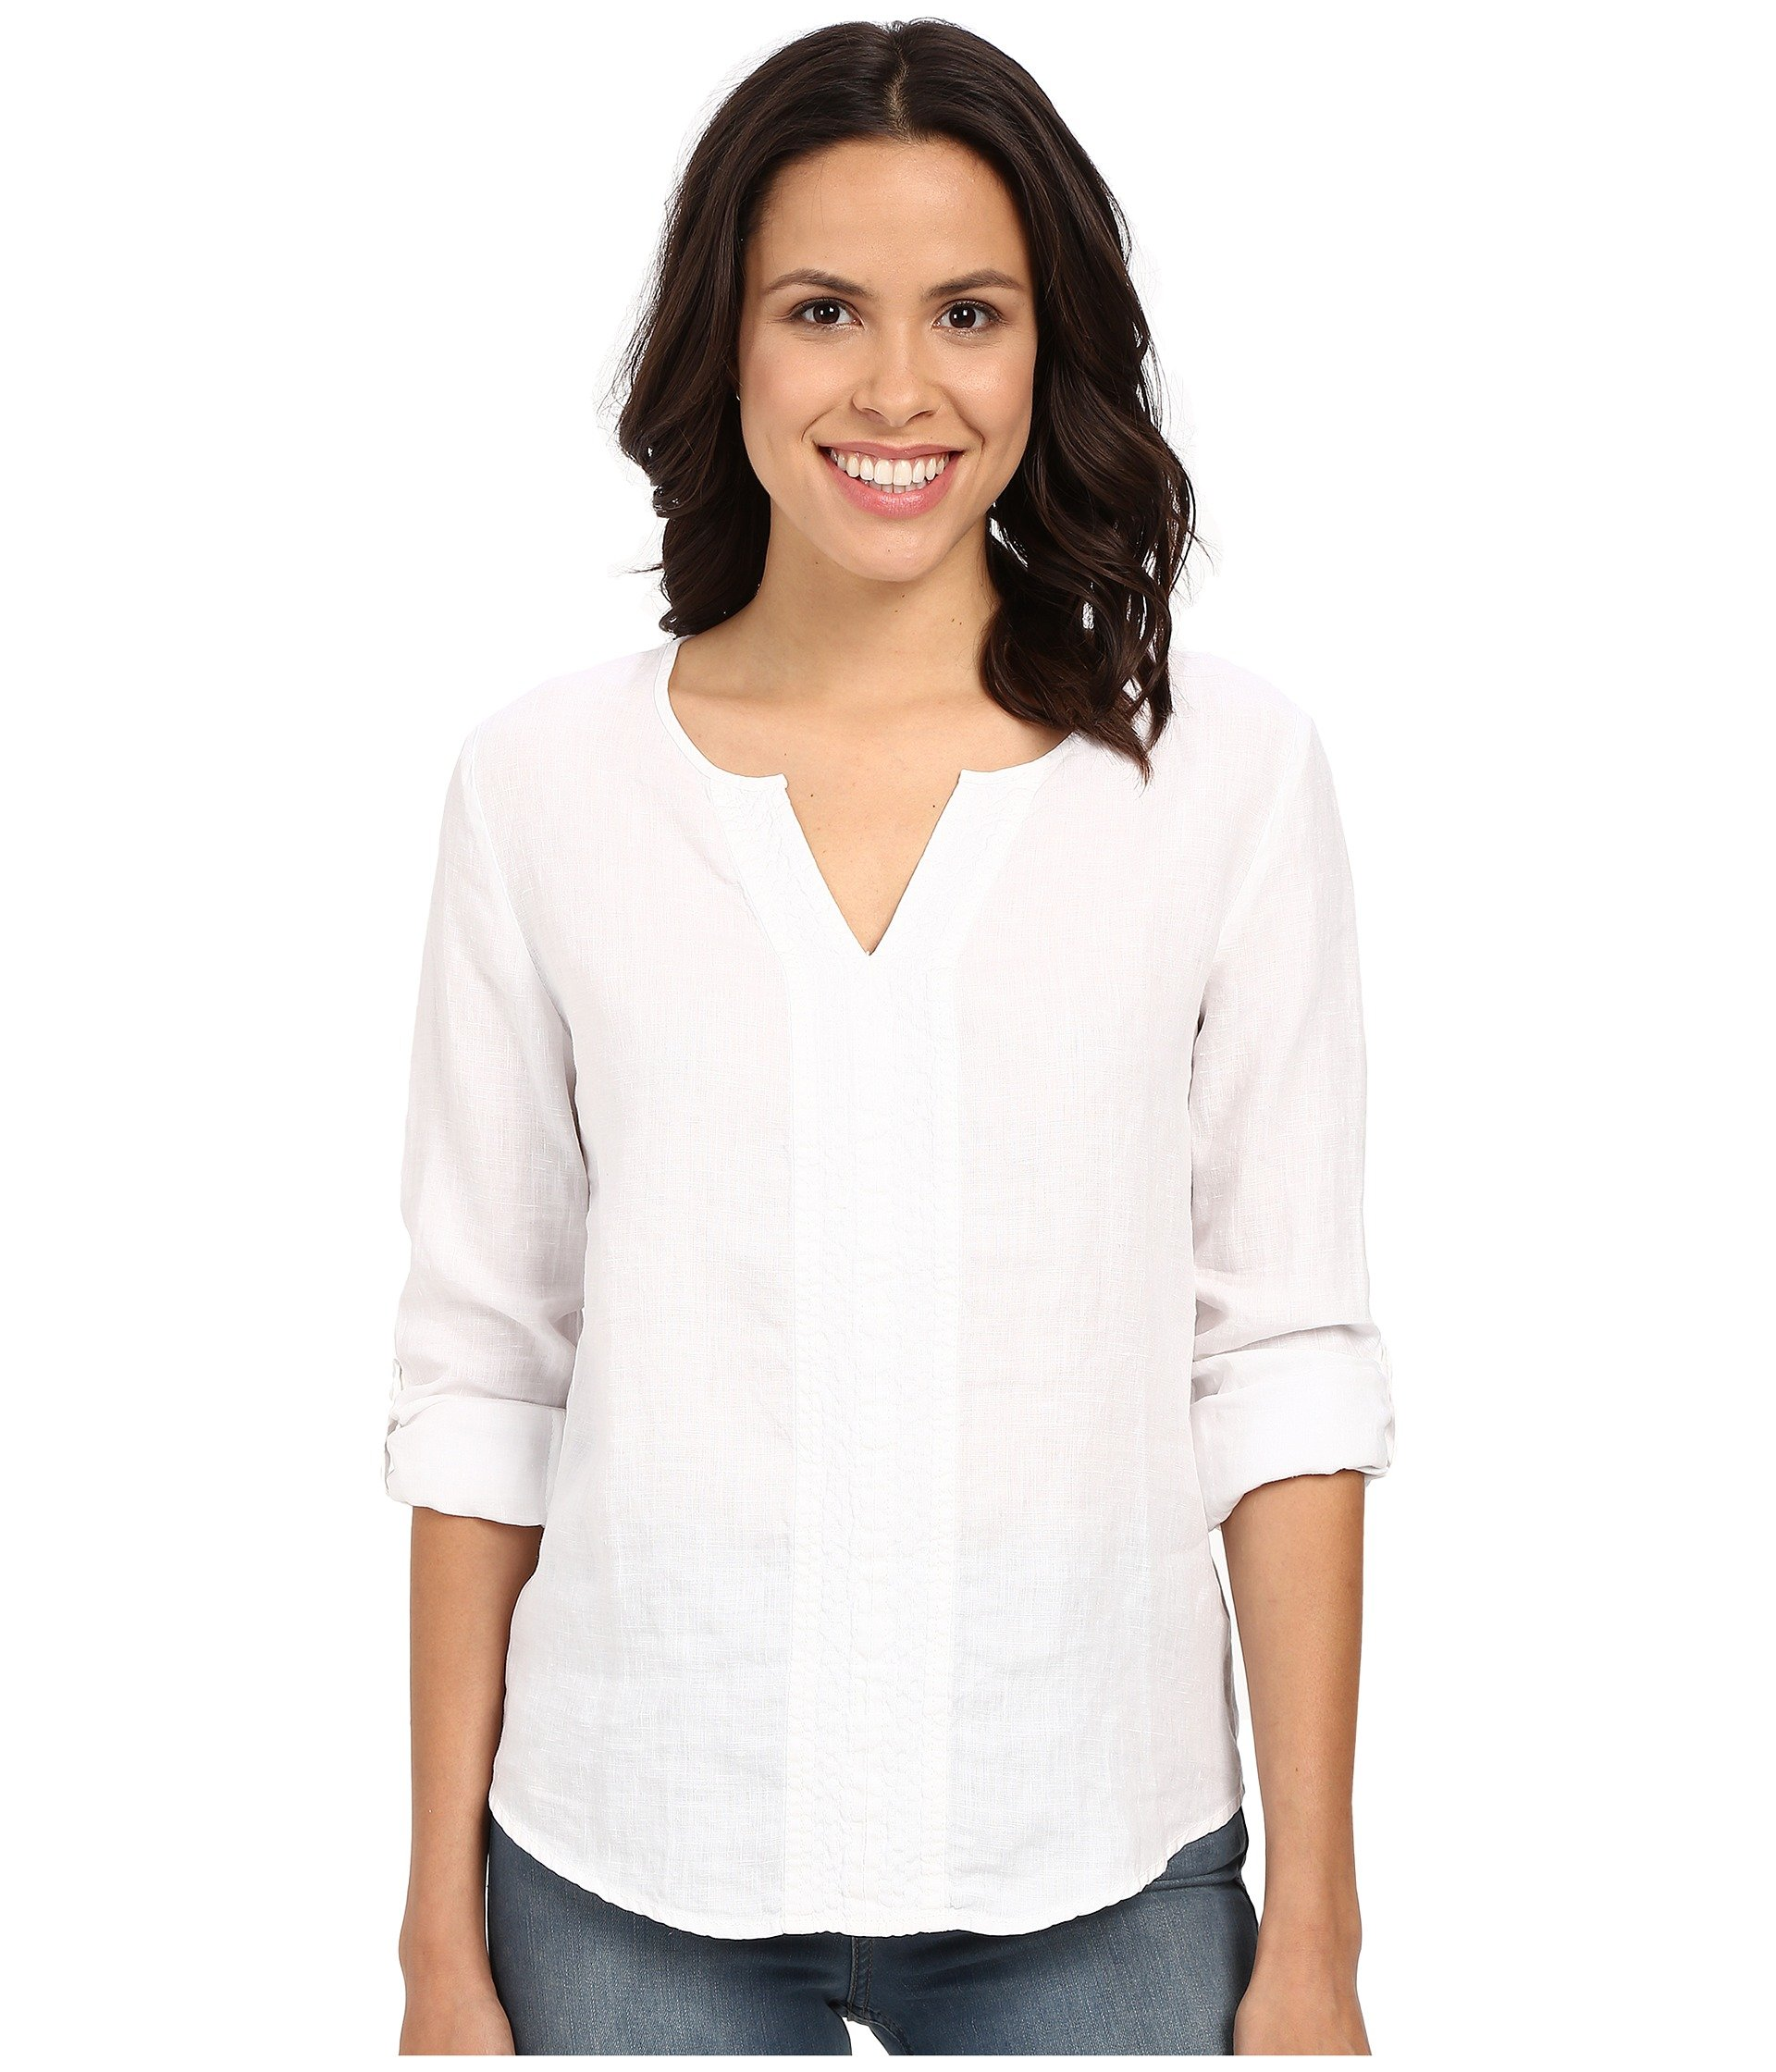 Yana Long Sleeve Top